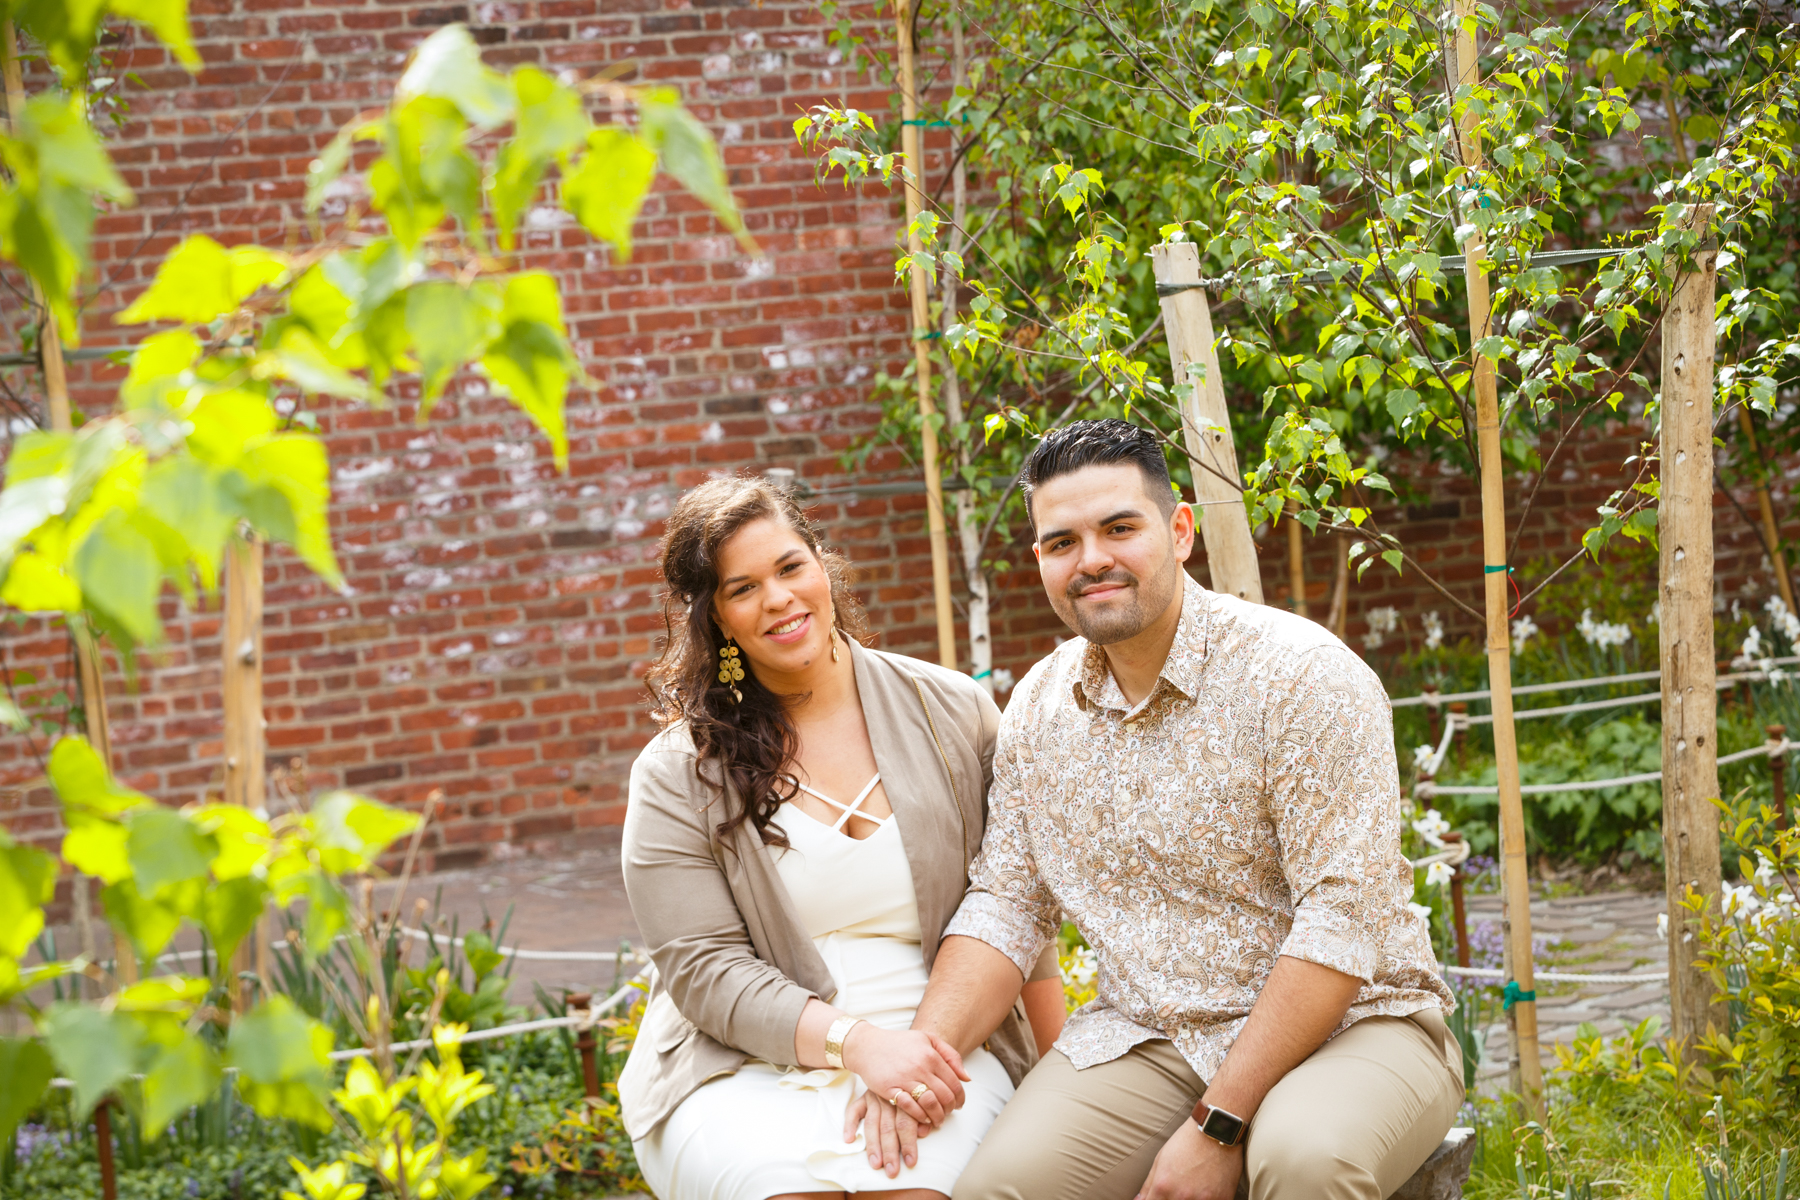 Johanna and Nathaniel Engagement _ Jonathan Heisler _ 5122017 _015.jpg